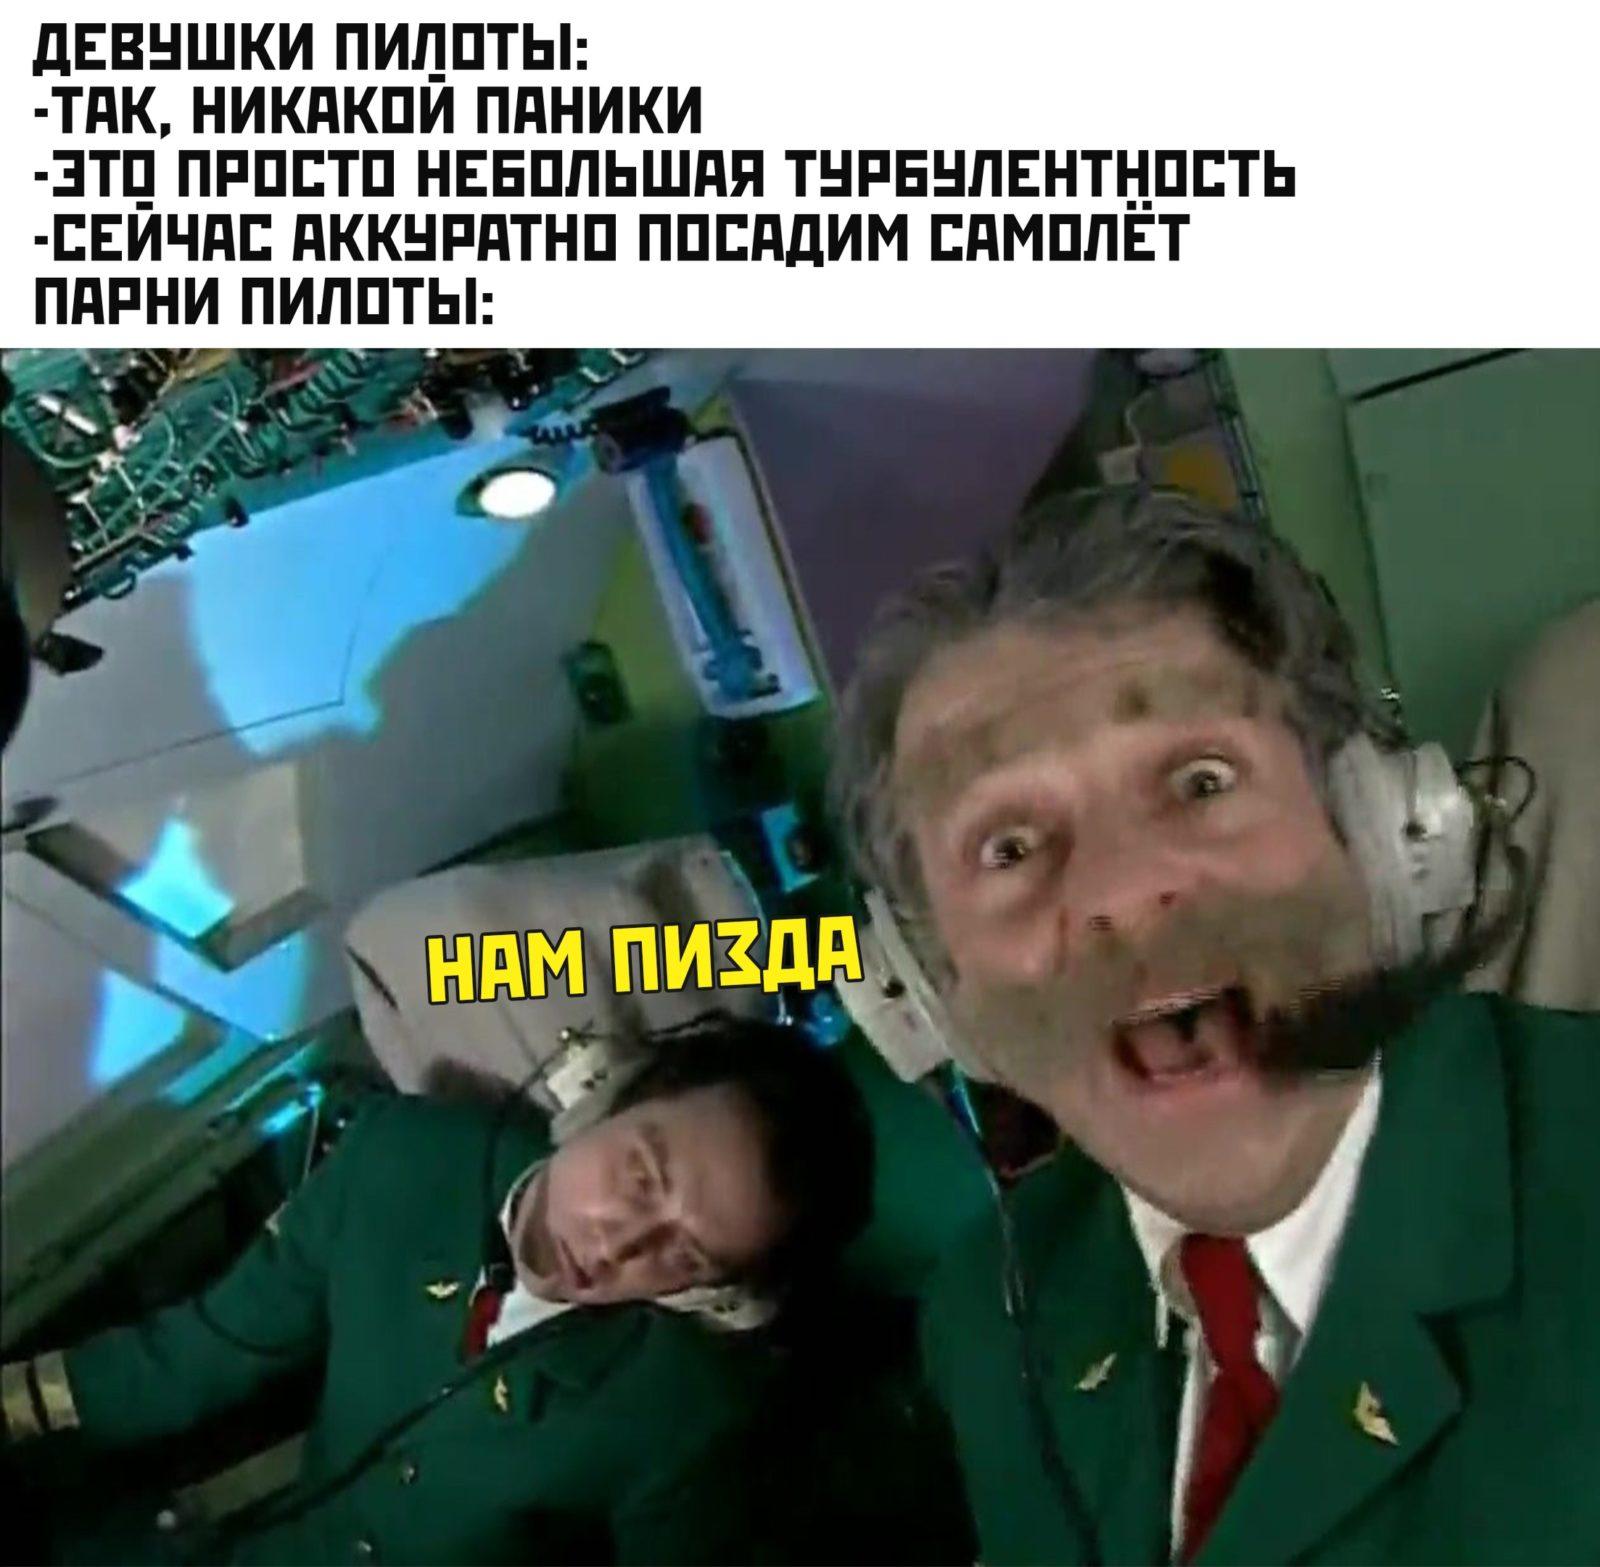 Девушки пилоты, парни пилоты